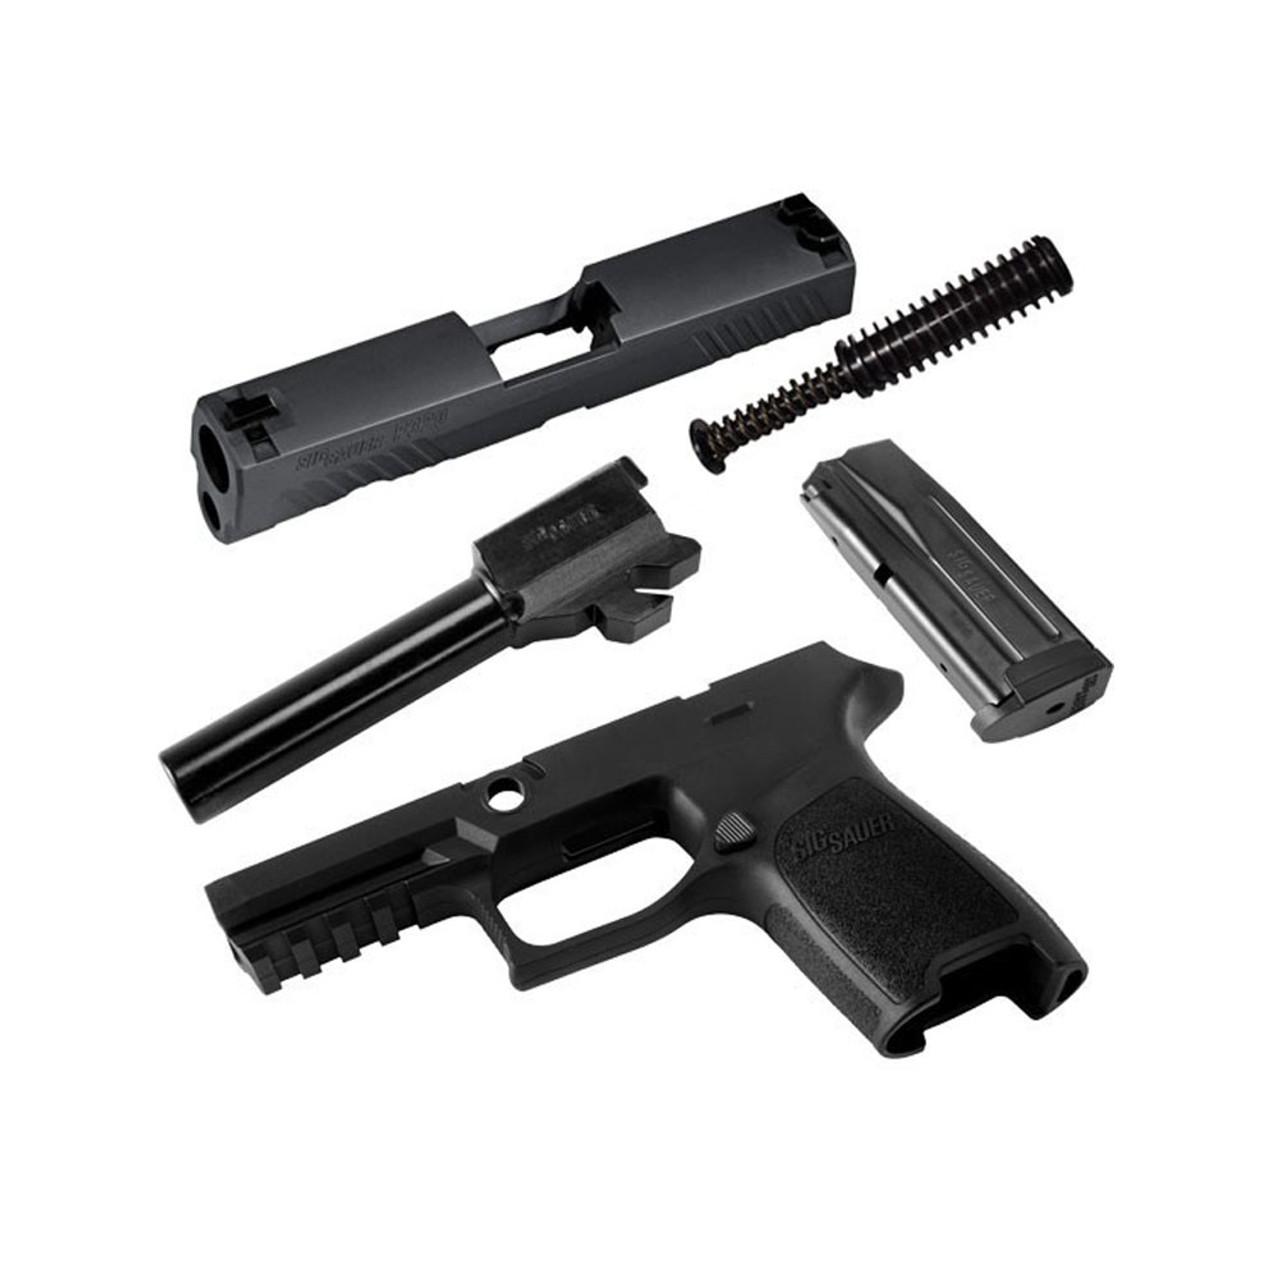 medium resolution of sig sauer p320 compact 9mm 15rd mag black caliber x change kit calx